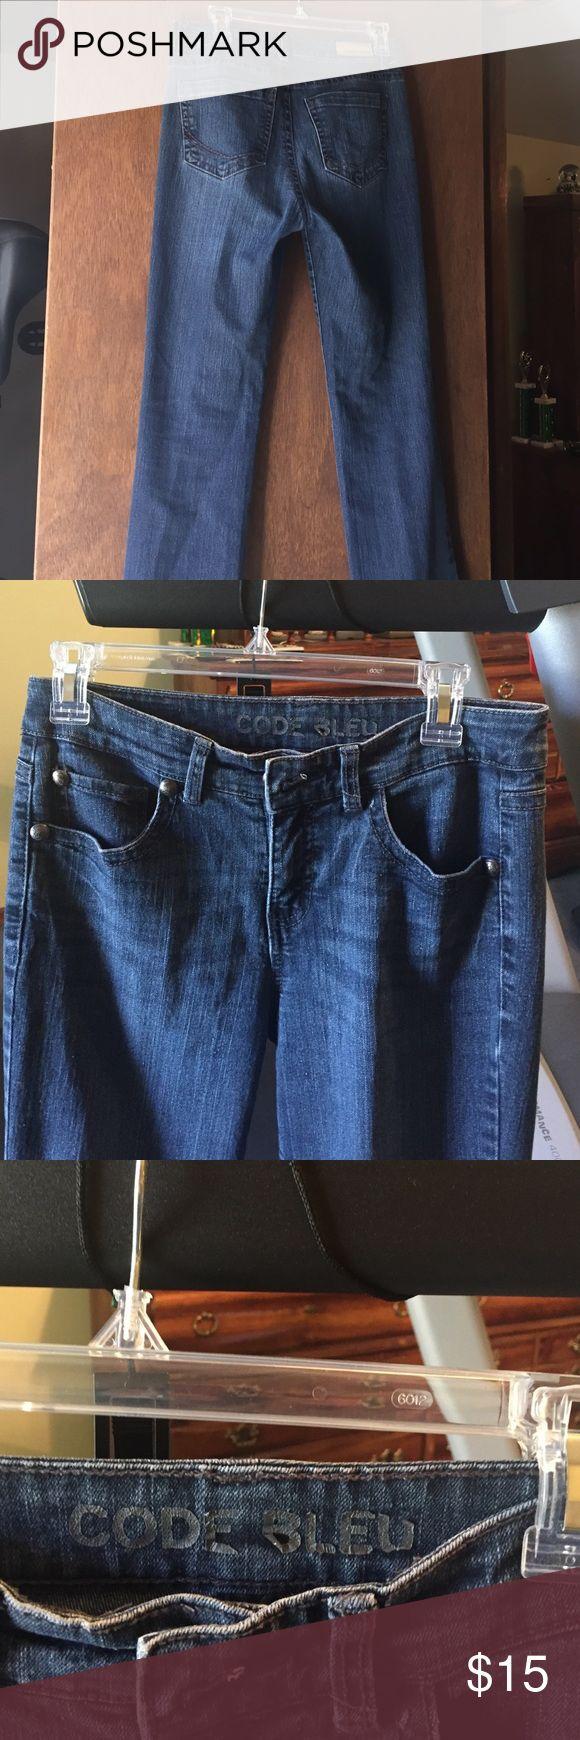 Missed jeans Code Bleu jeans , great condition ! code bleu Pants Straight Leg